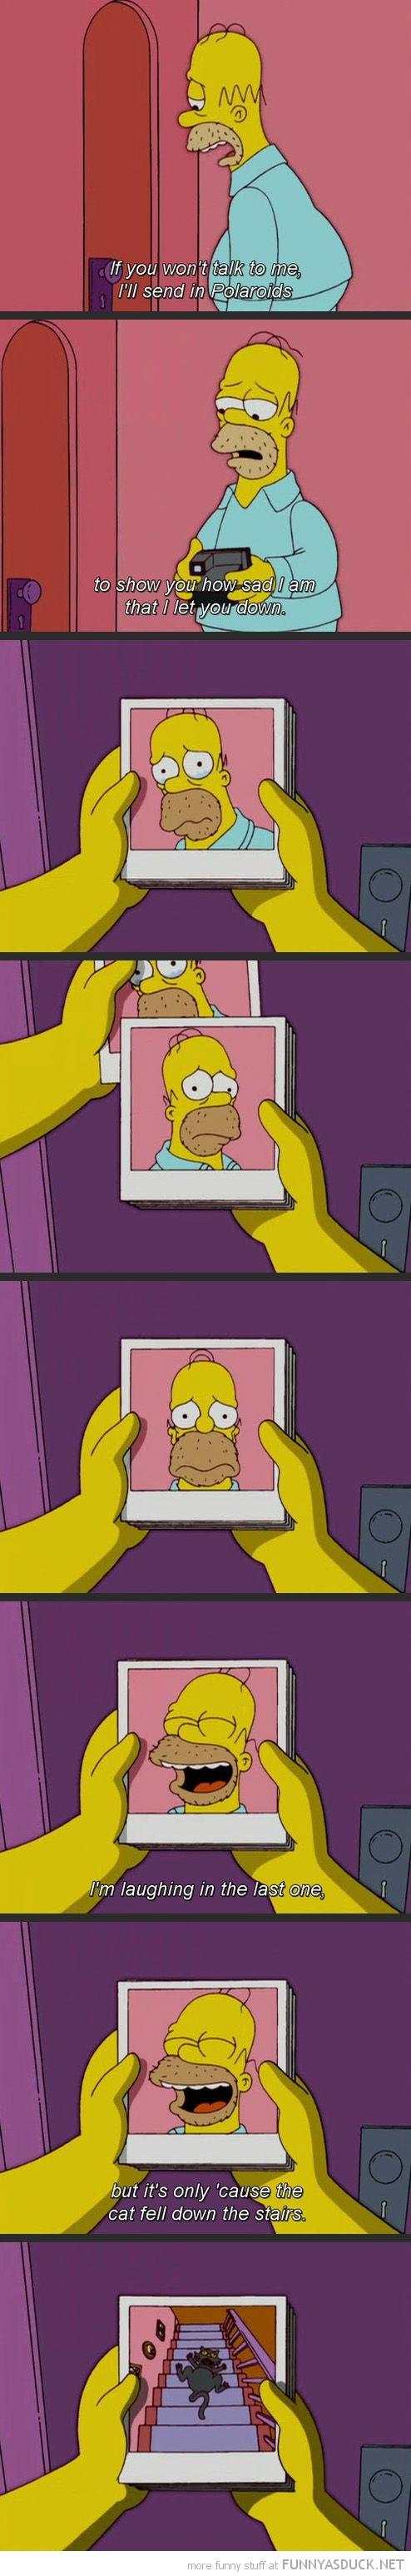 Send Polaroids